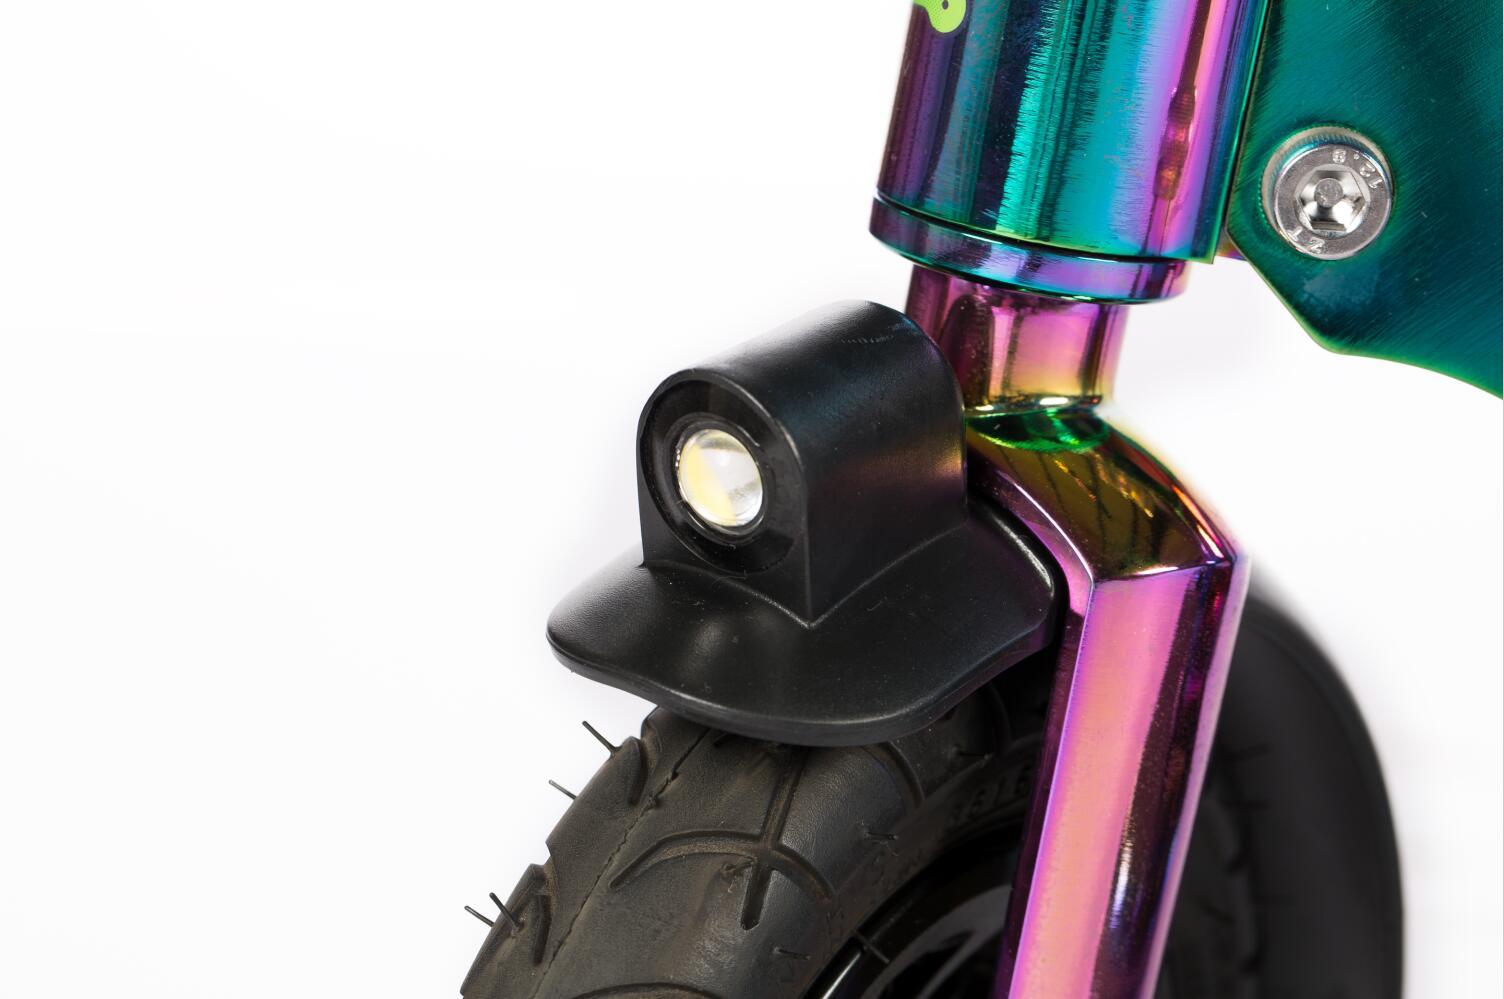 chrome scooter